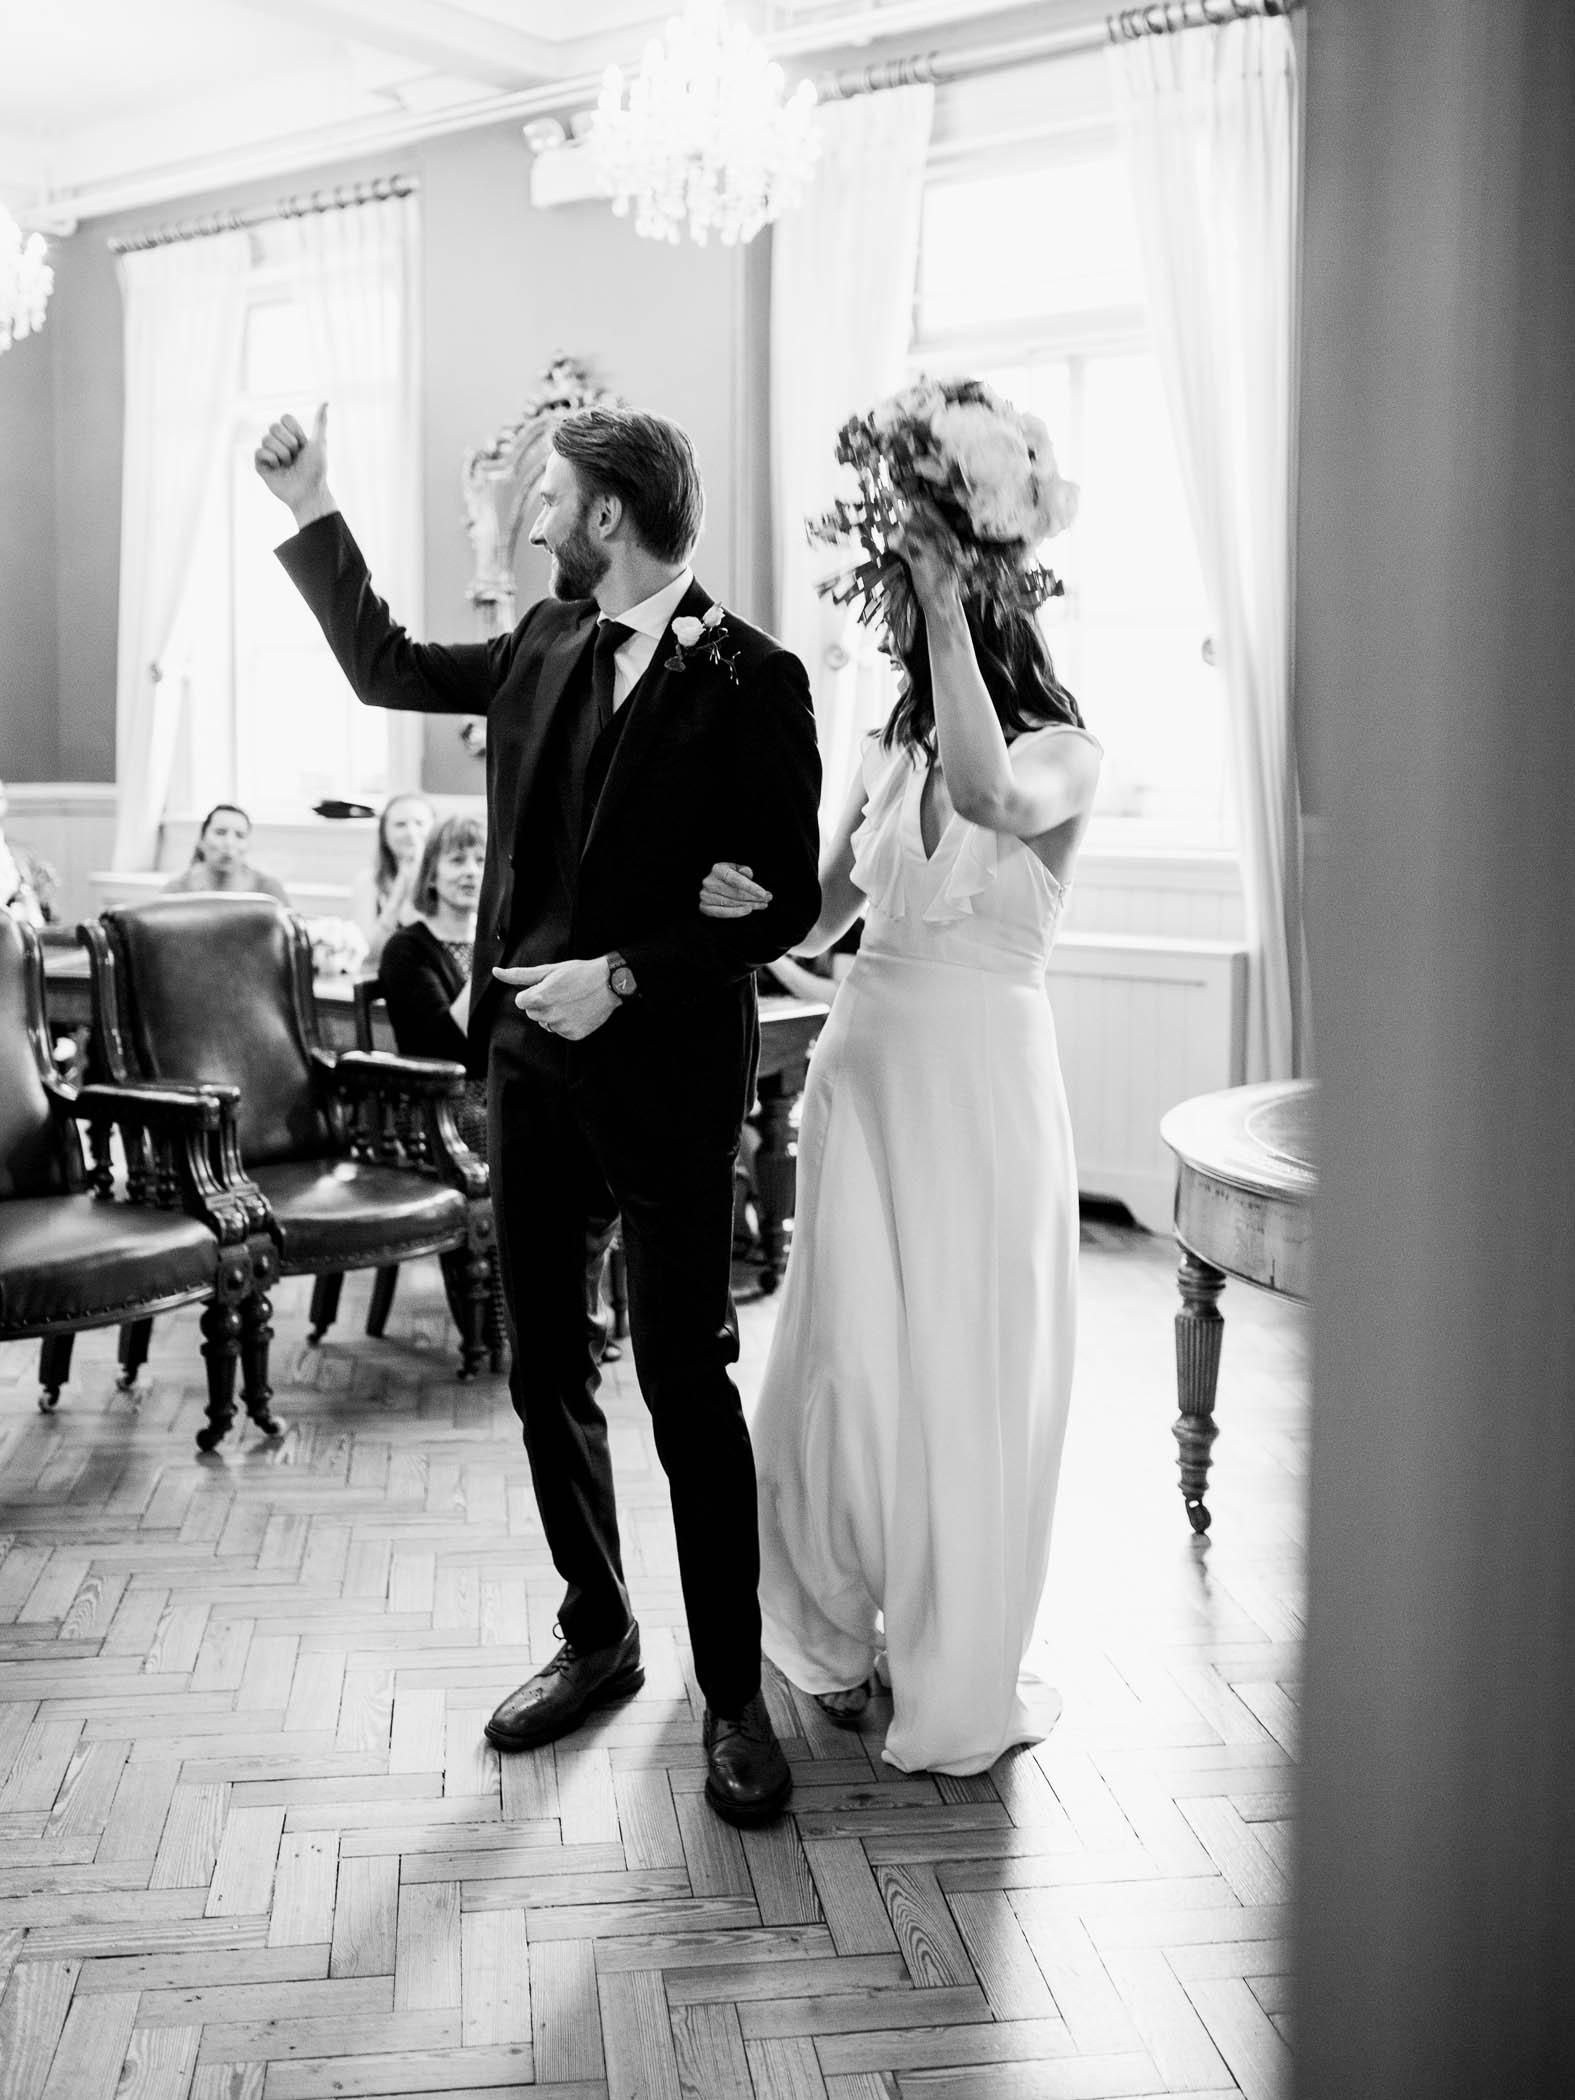 Amy O'Boyle Photography- Destination & UK Fine Art Film Wedding Photographer- The Anna Edit Wedding Brighton-27.jpg